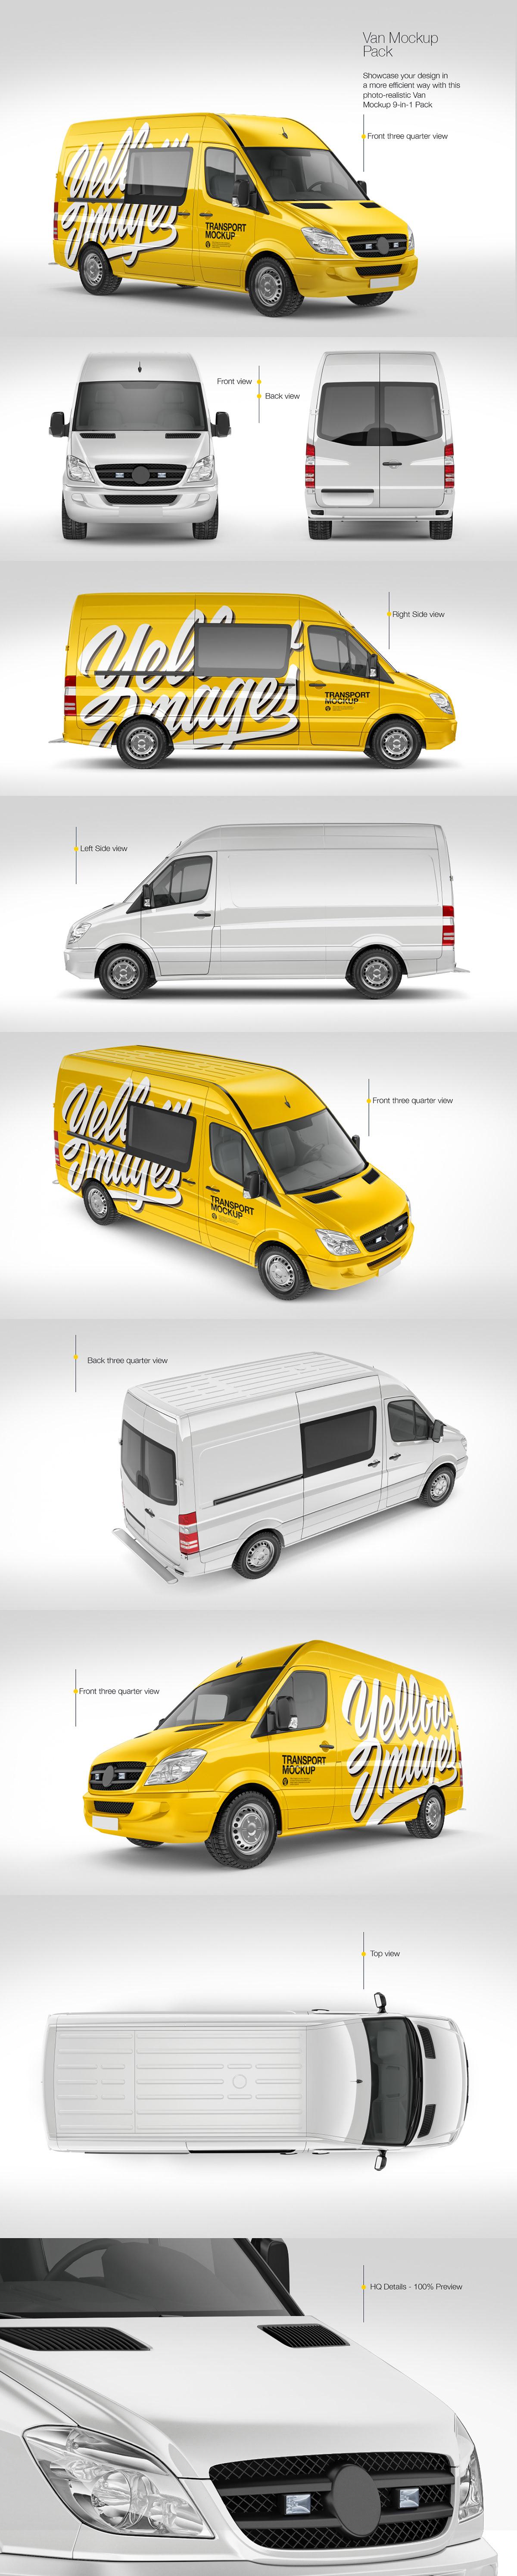 Download Rendering Vehicle For Mock Ups On Behance PSD Mockup Templates